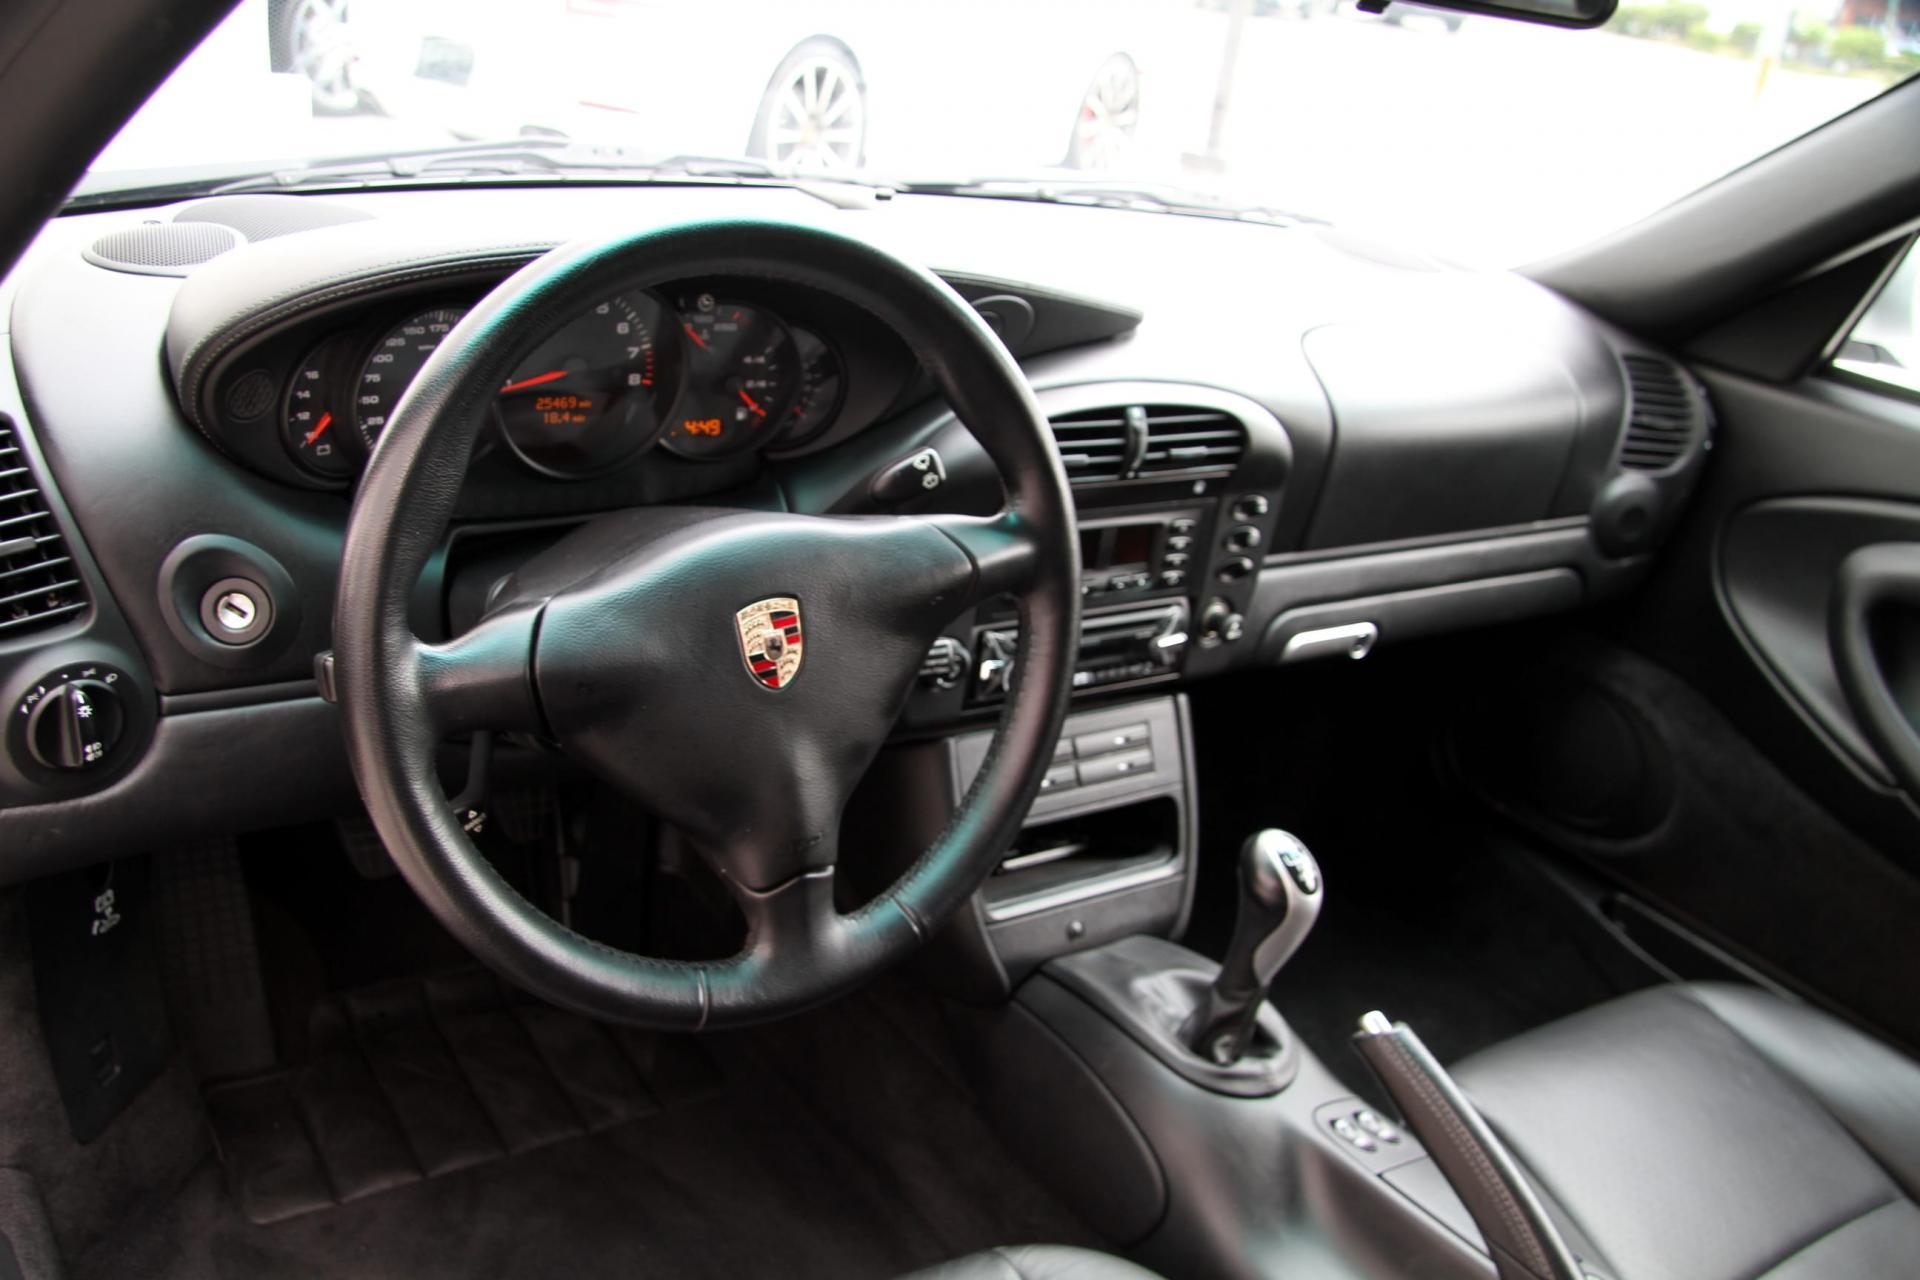 Dealer Near Me >> 2002 Porsche 911 Carrera 4S Stock # 5955 for sale near Redondo Beach, CA   CA Porsche Dealer